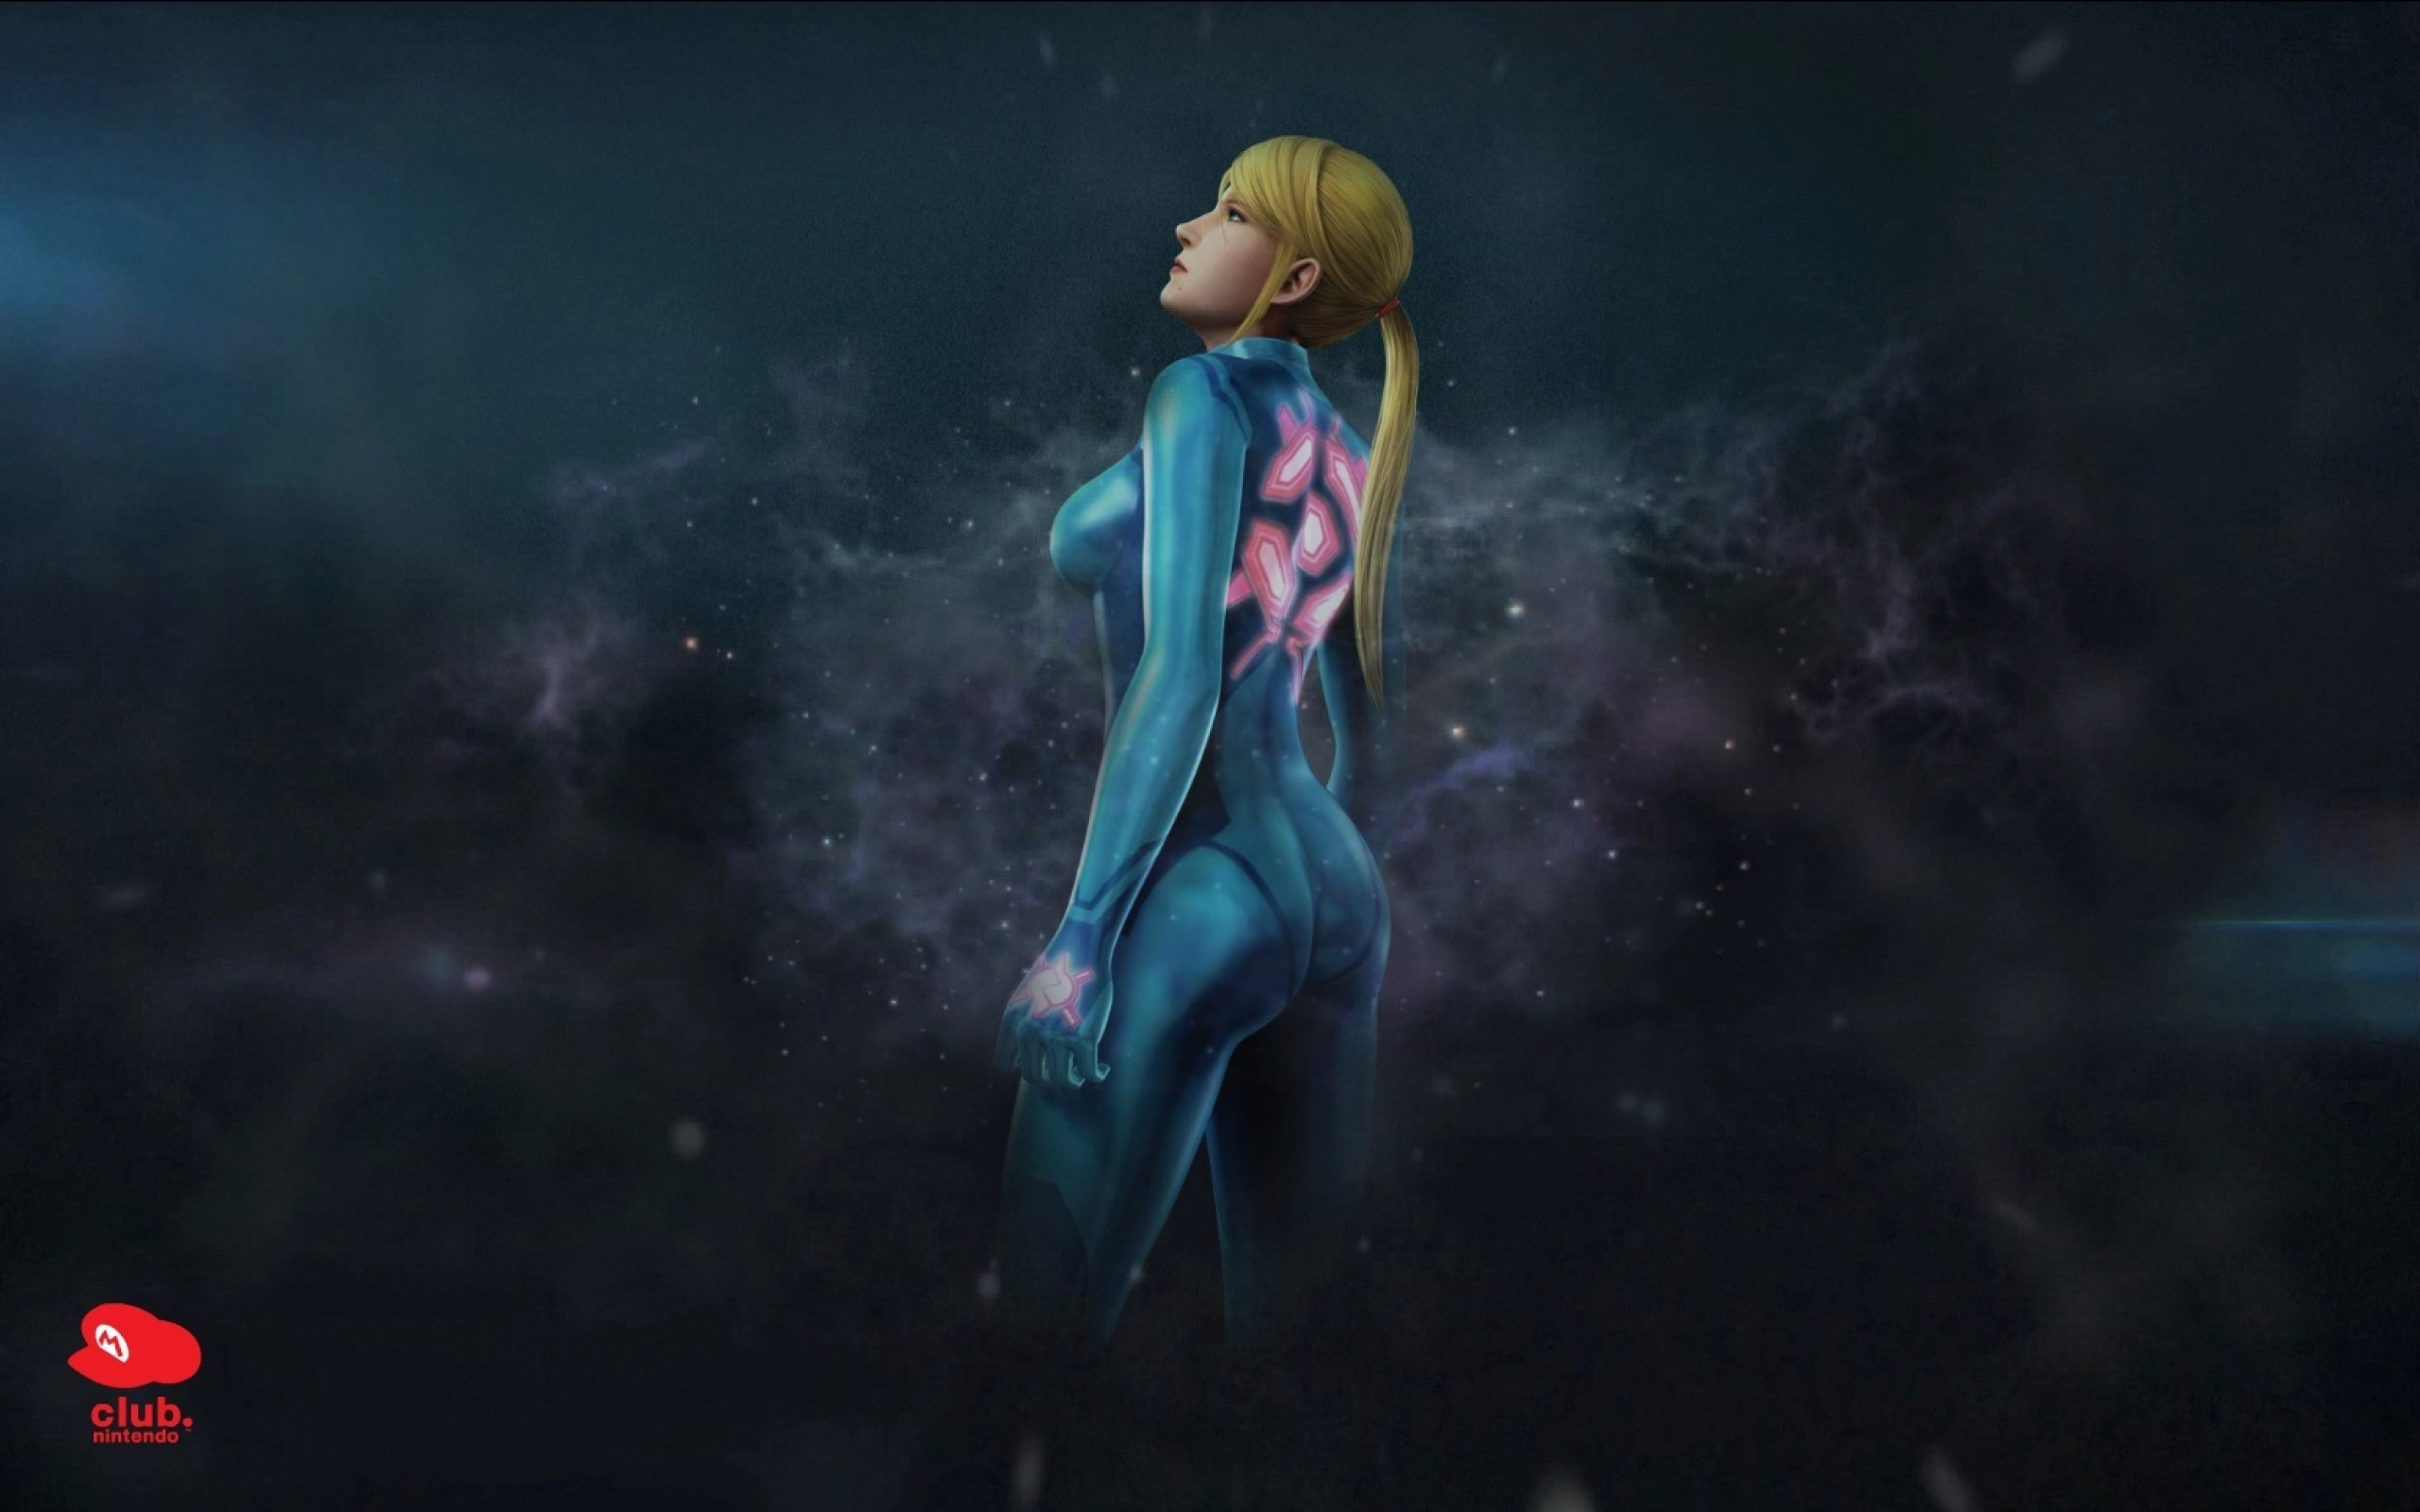 2560x1600 Wallpaper Metroid A Zero Suit Samus Aran